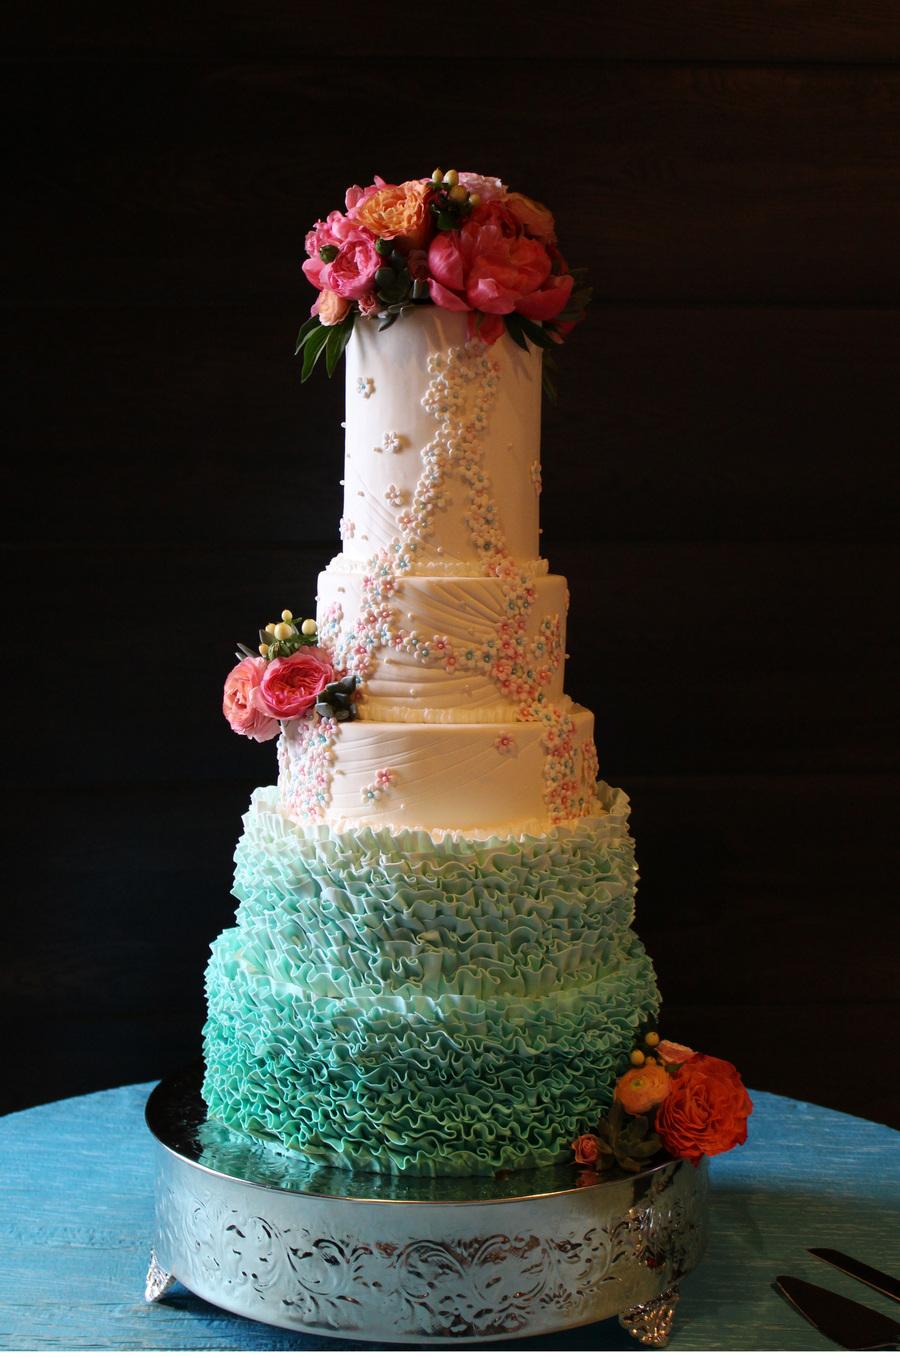 5 Tier Ombre Ruffles And Handmade Sugar Flower Cake For